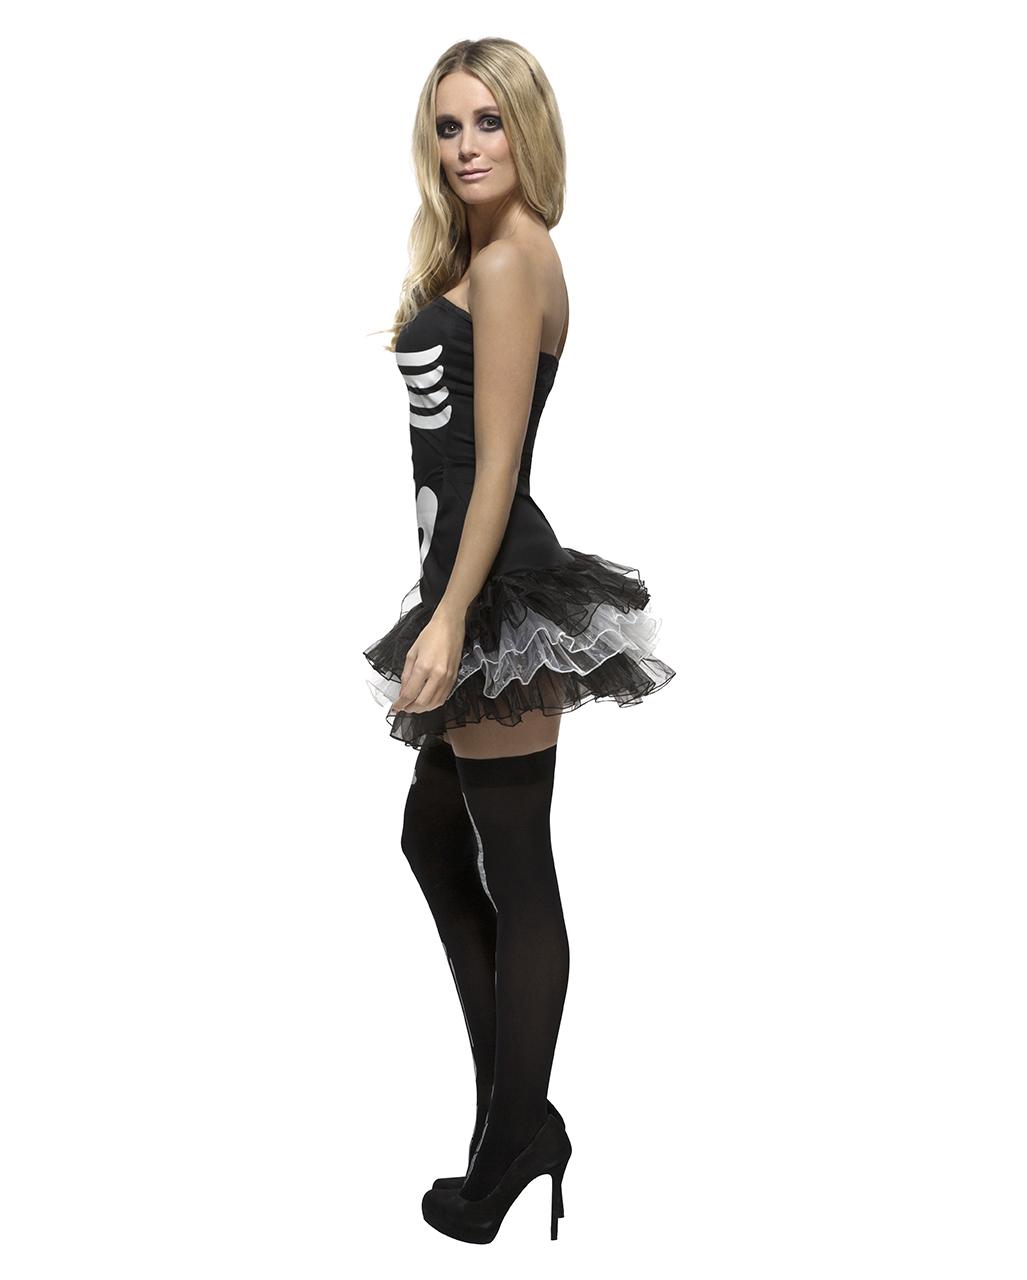 Ballet Skeleton Costume - Skeleton Ballerina Disguise Halloween - Sexy Skeleton Dress